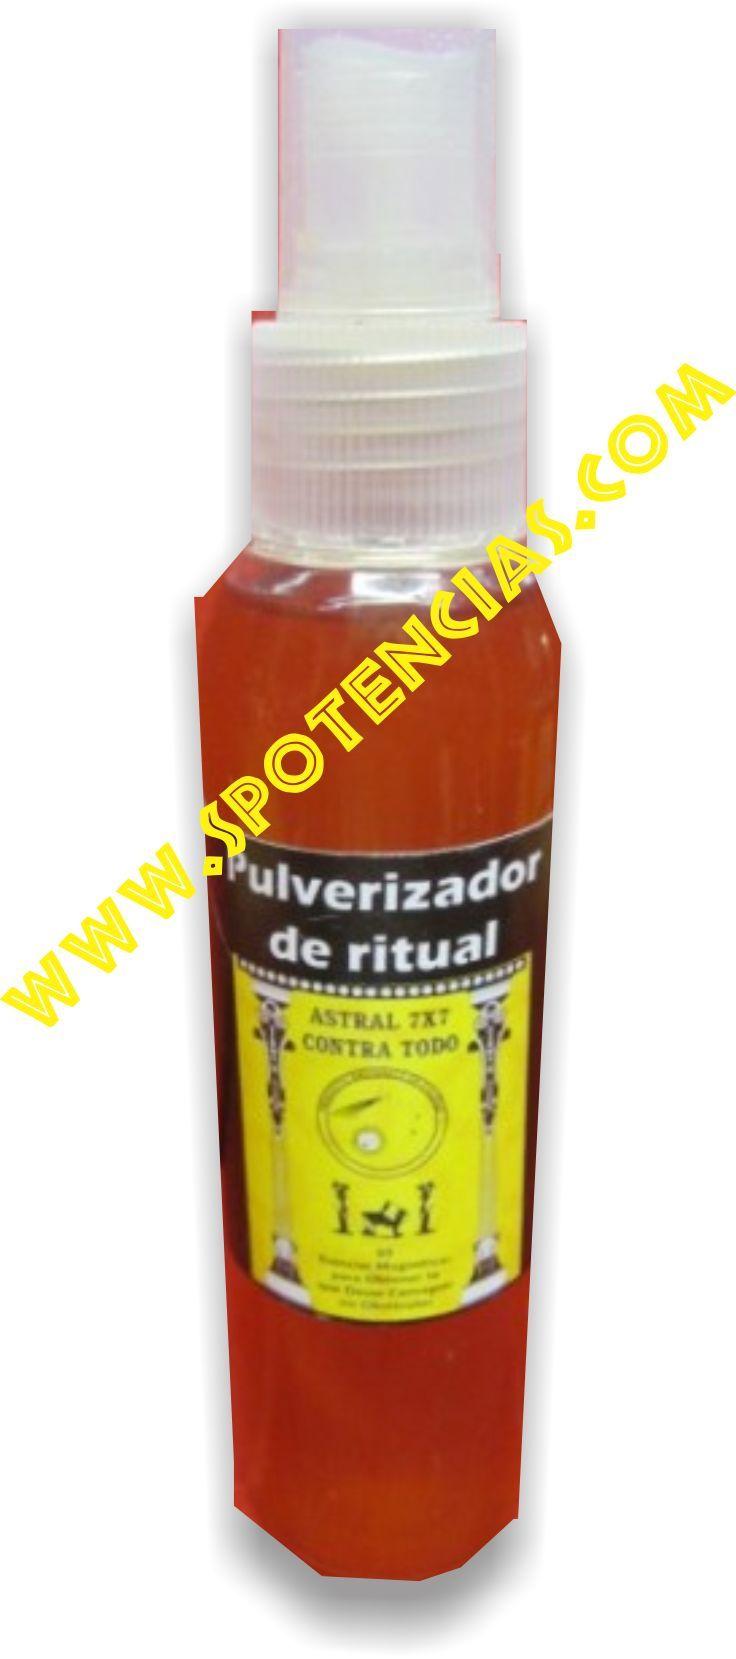 pulverizador 7x7 contra todo www.spotencias.com